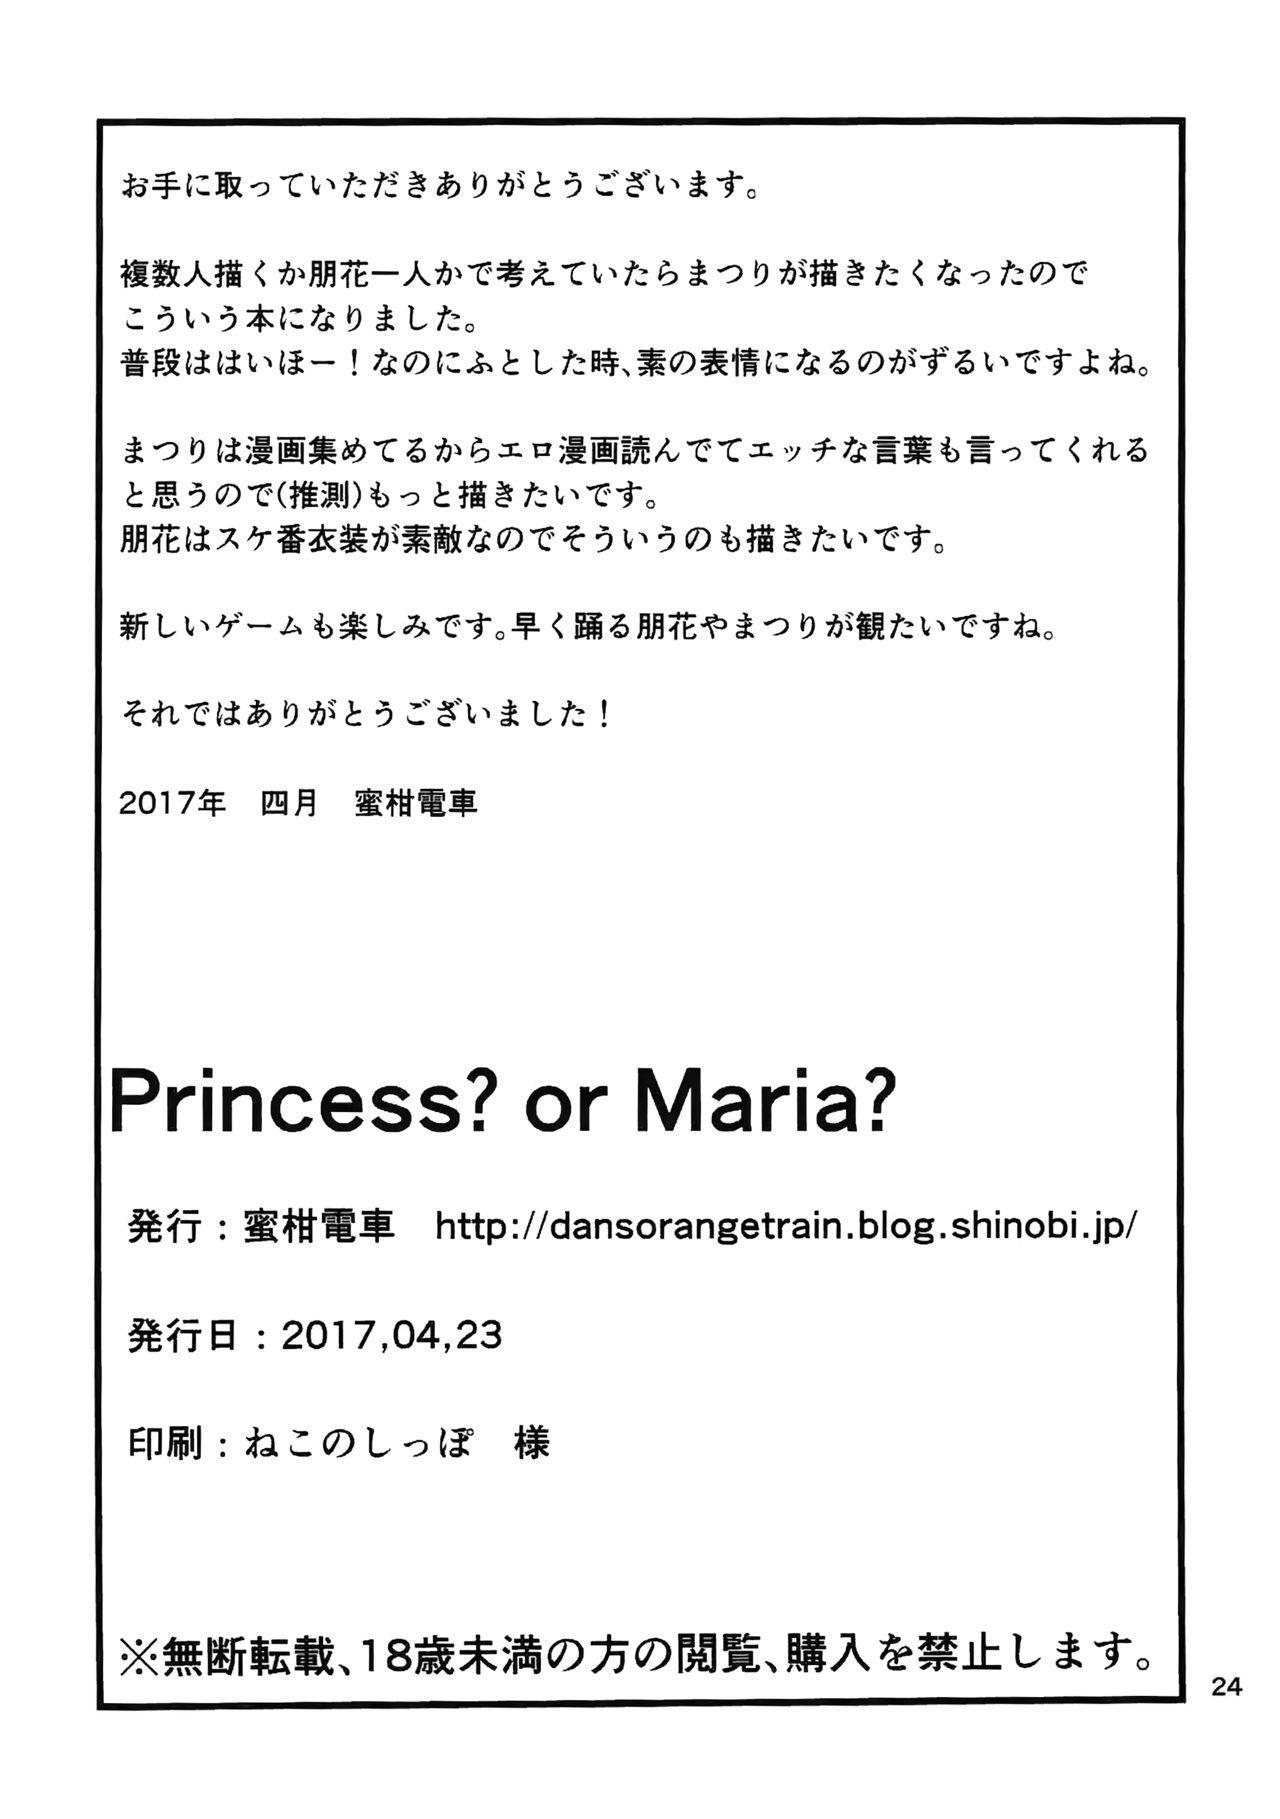 Princess? or Maria? 25